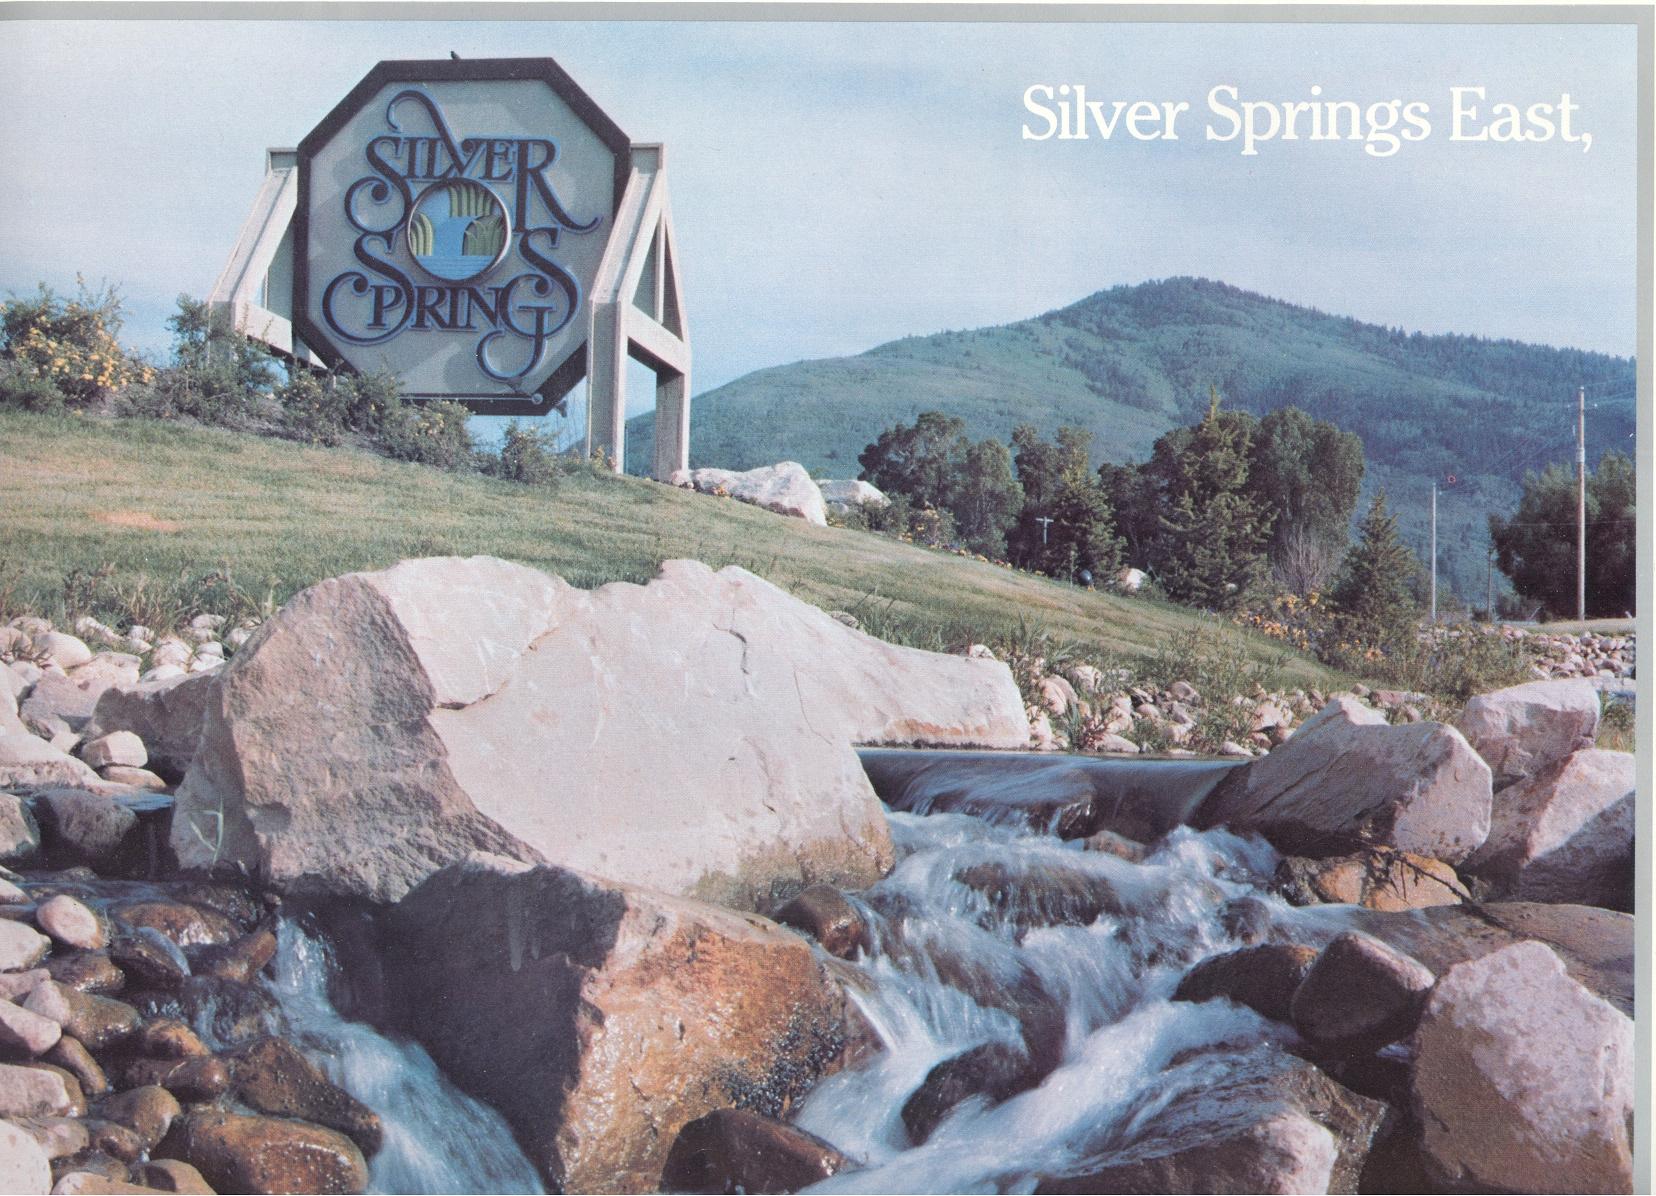 1979-SSEast-brochure-1st-picture